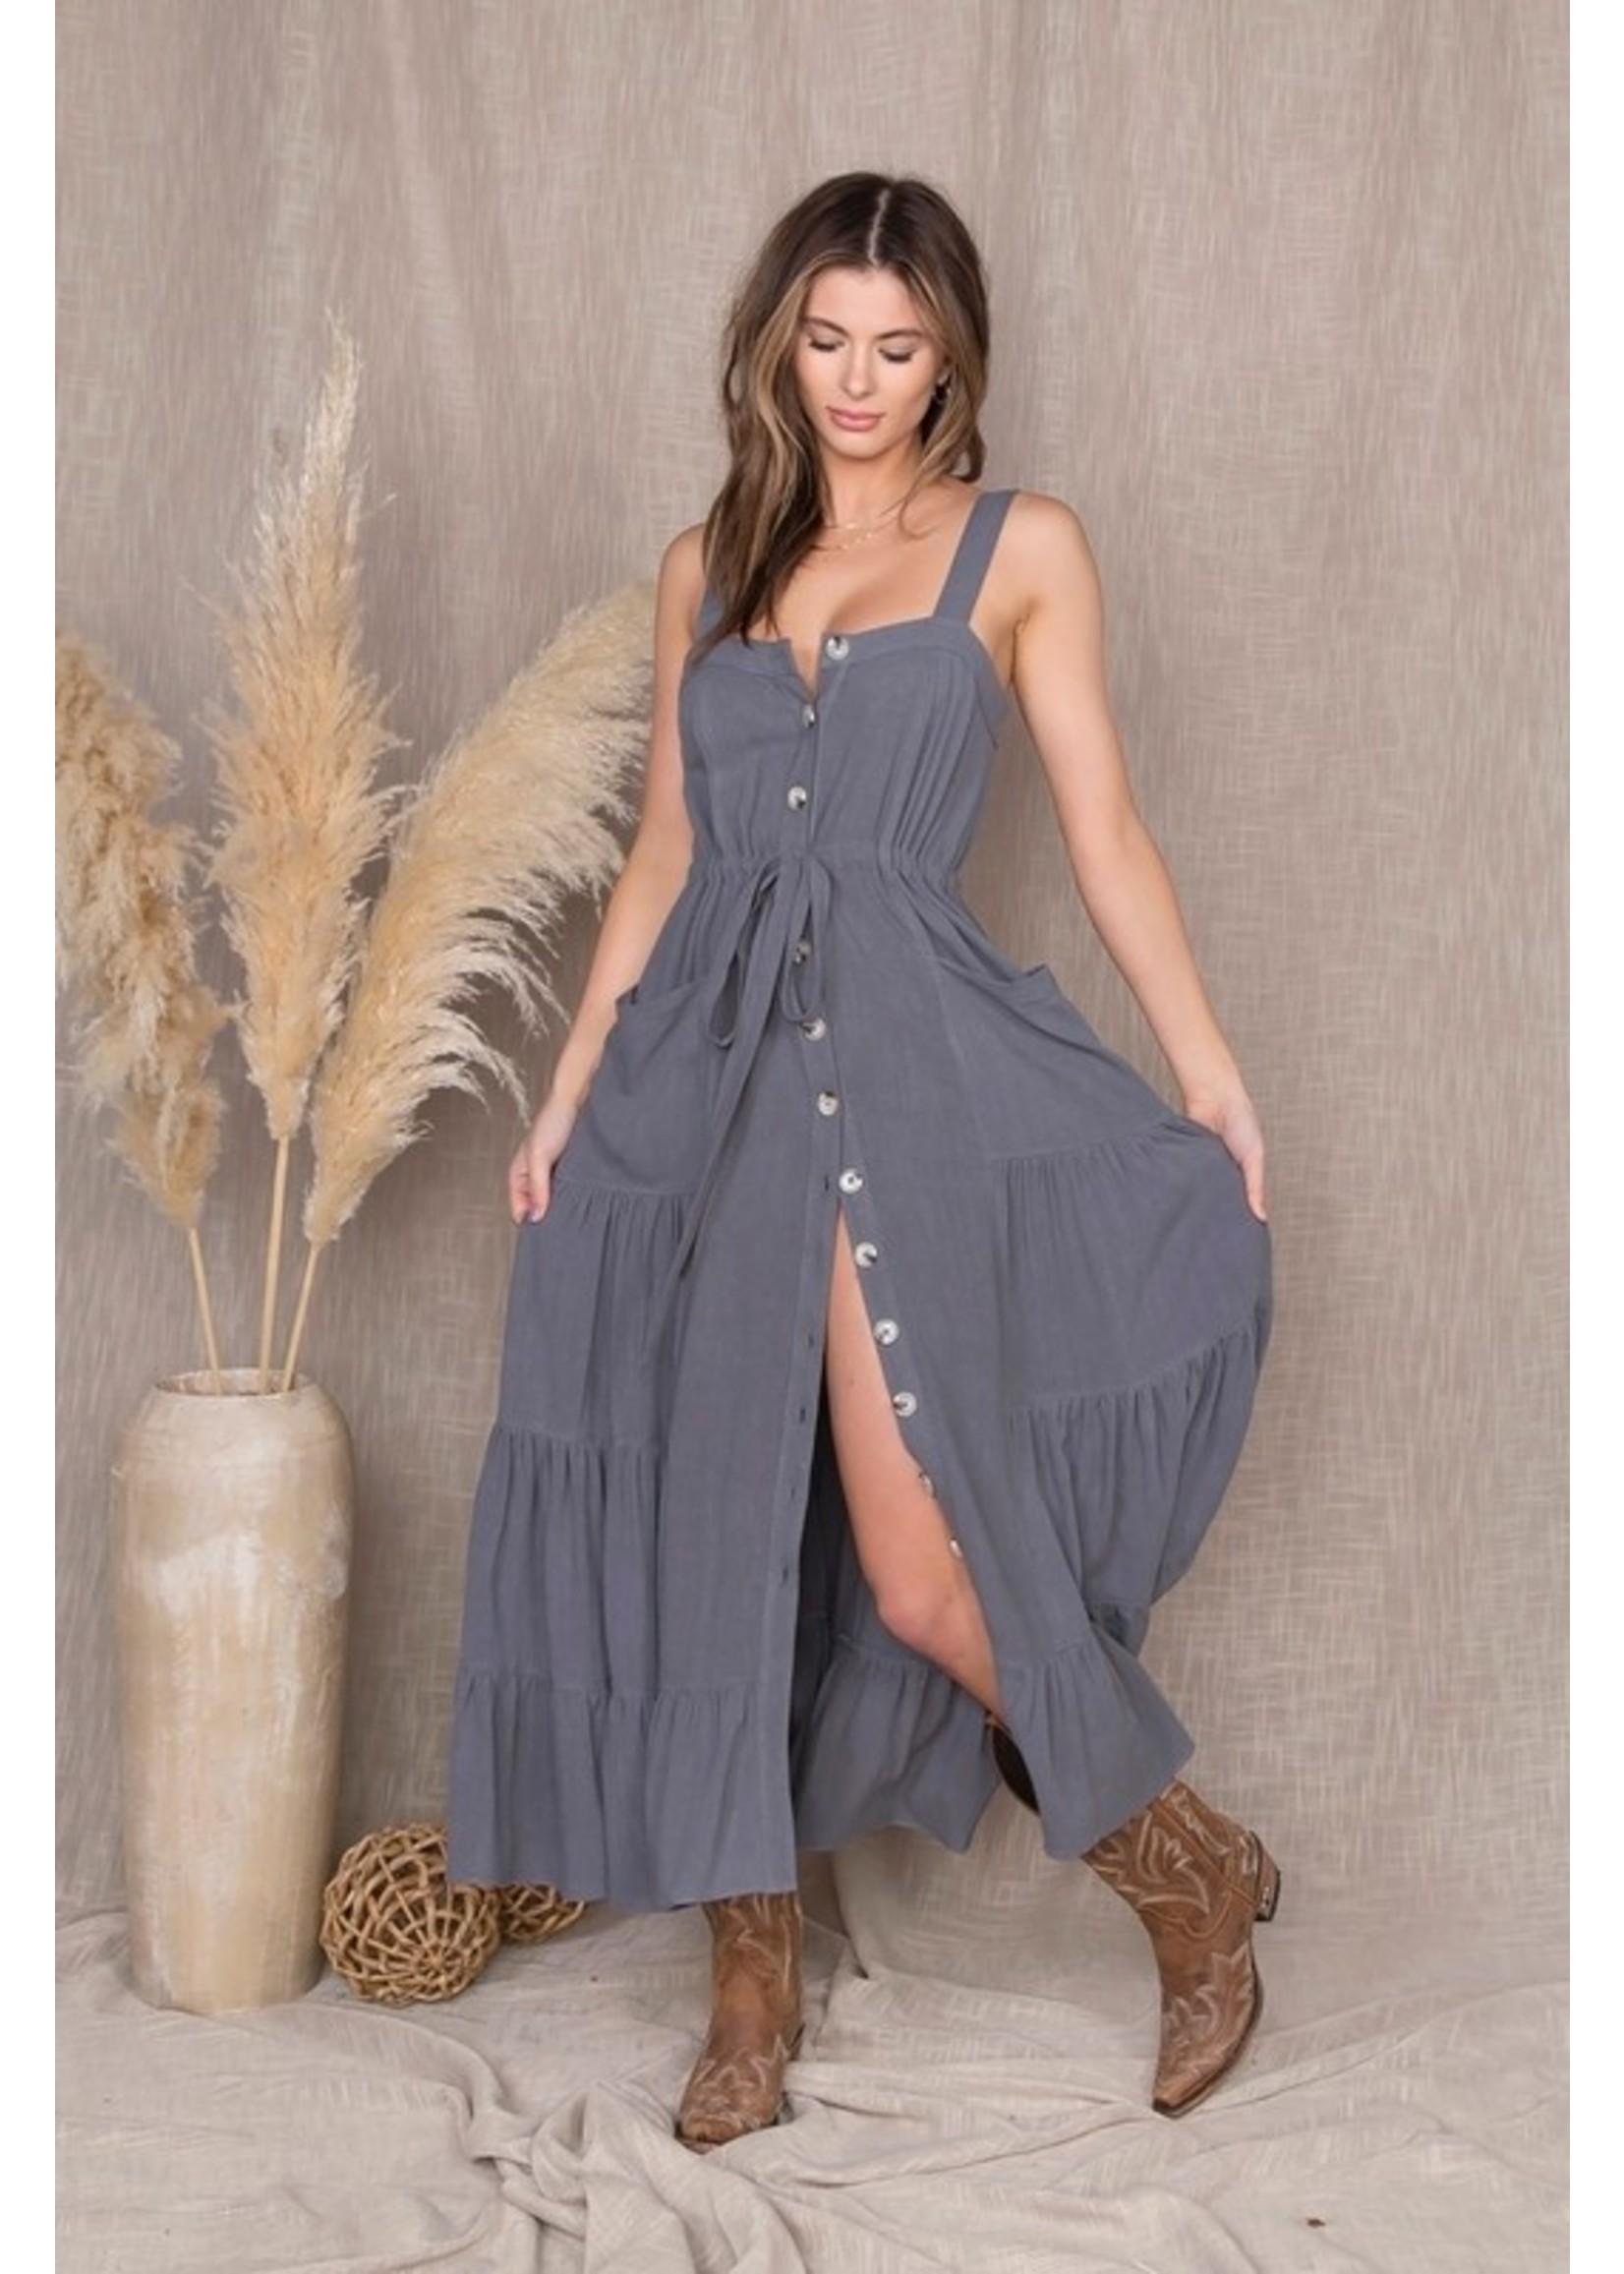 Malibu Bum Sea Escape Dress Blue